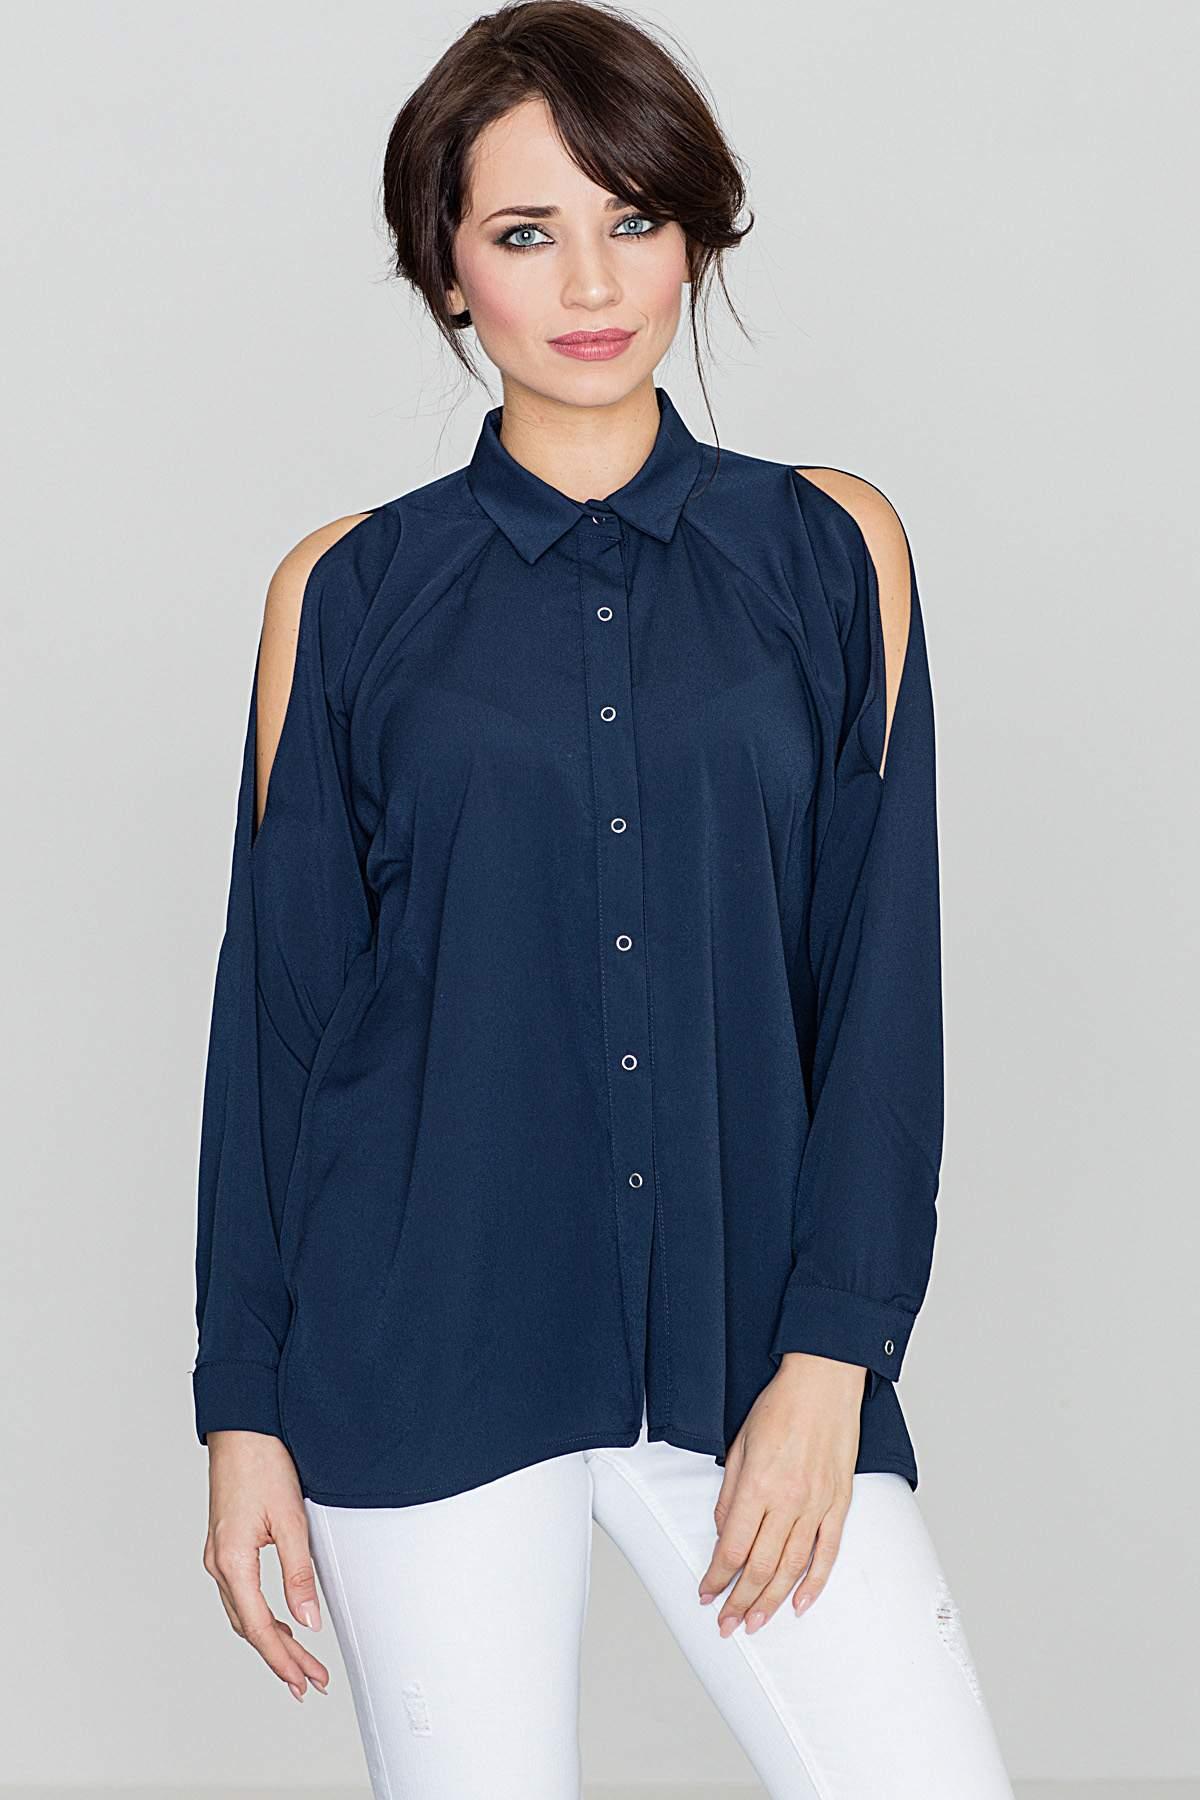 KATRUS γυναικειο εξωμο πουκαμισο